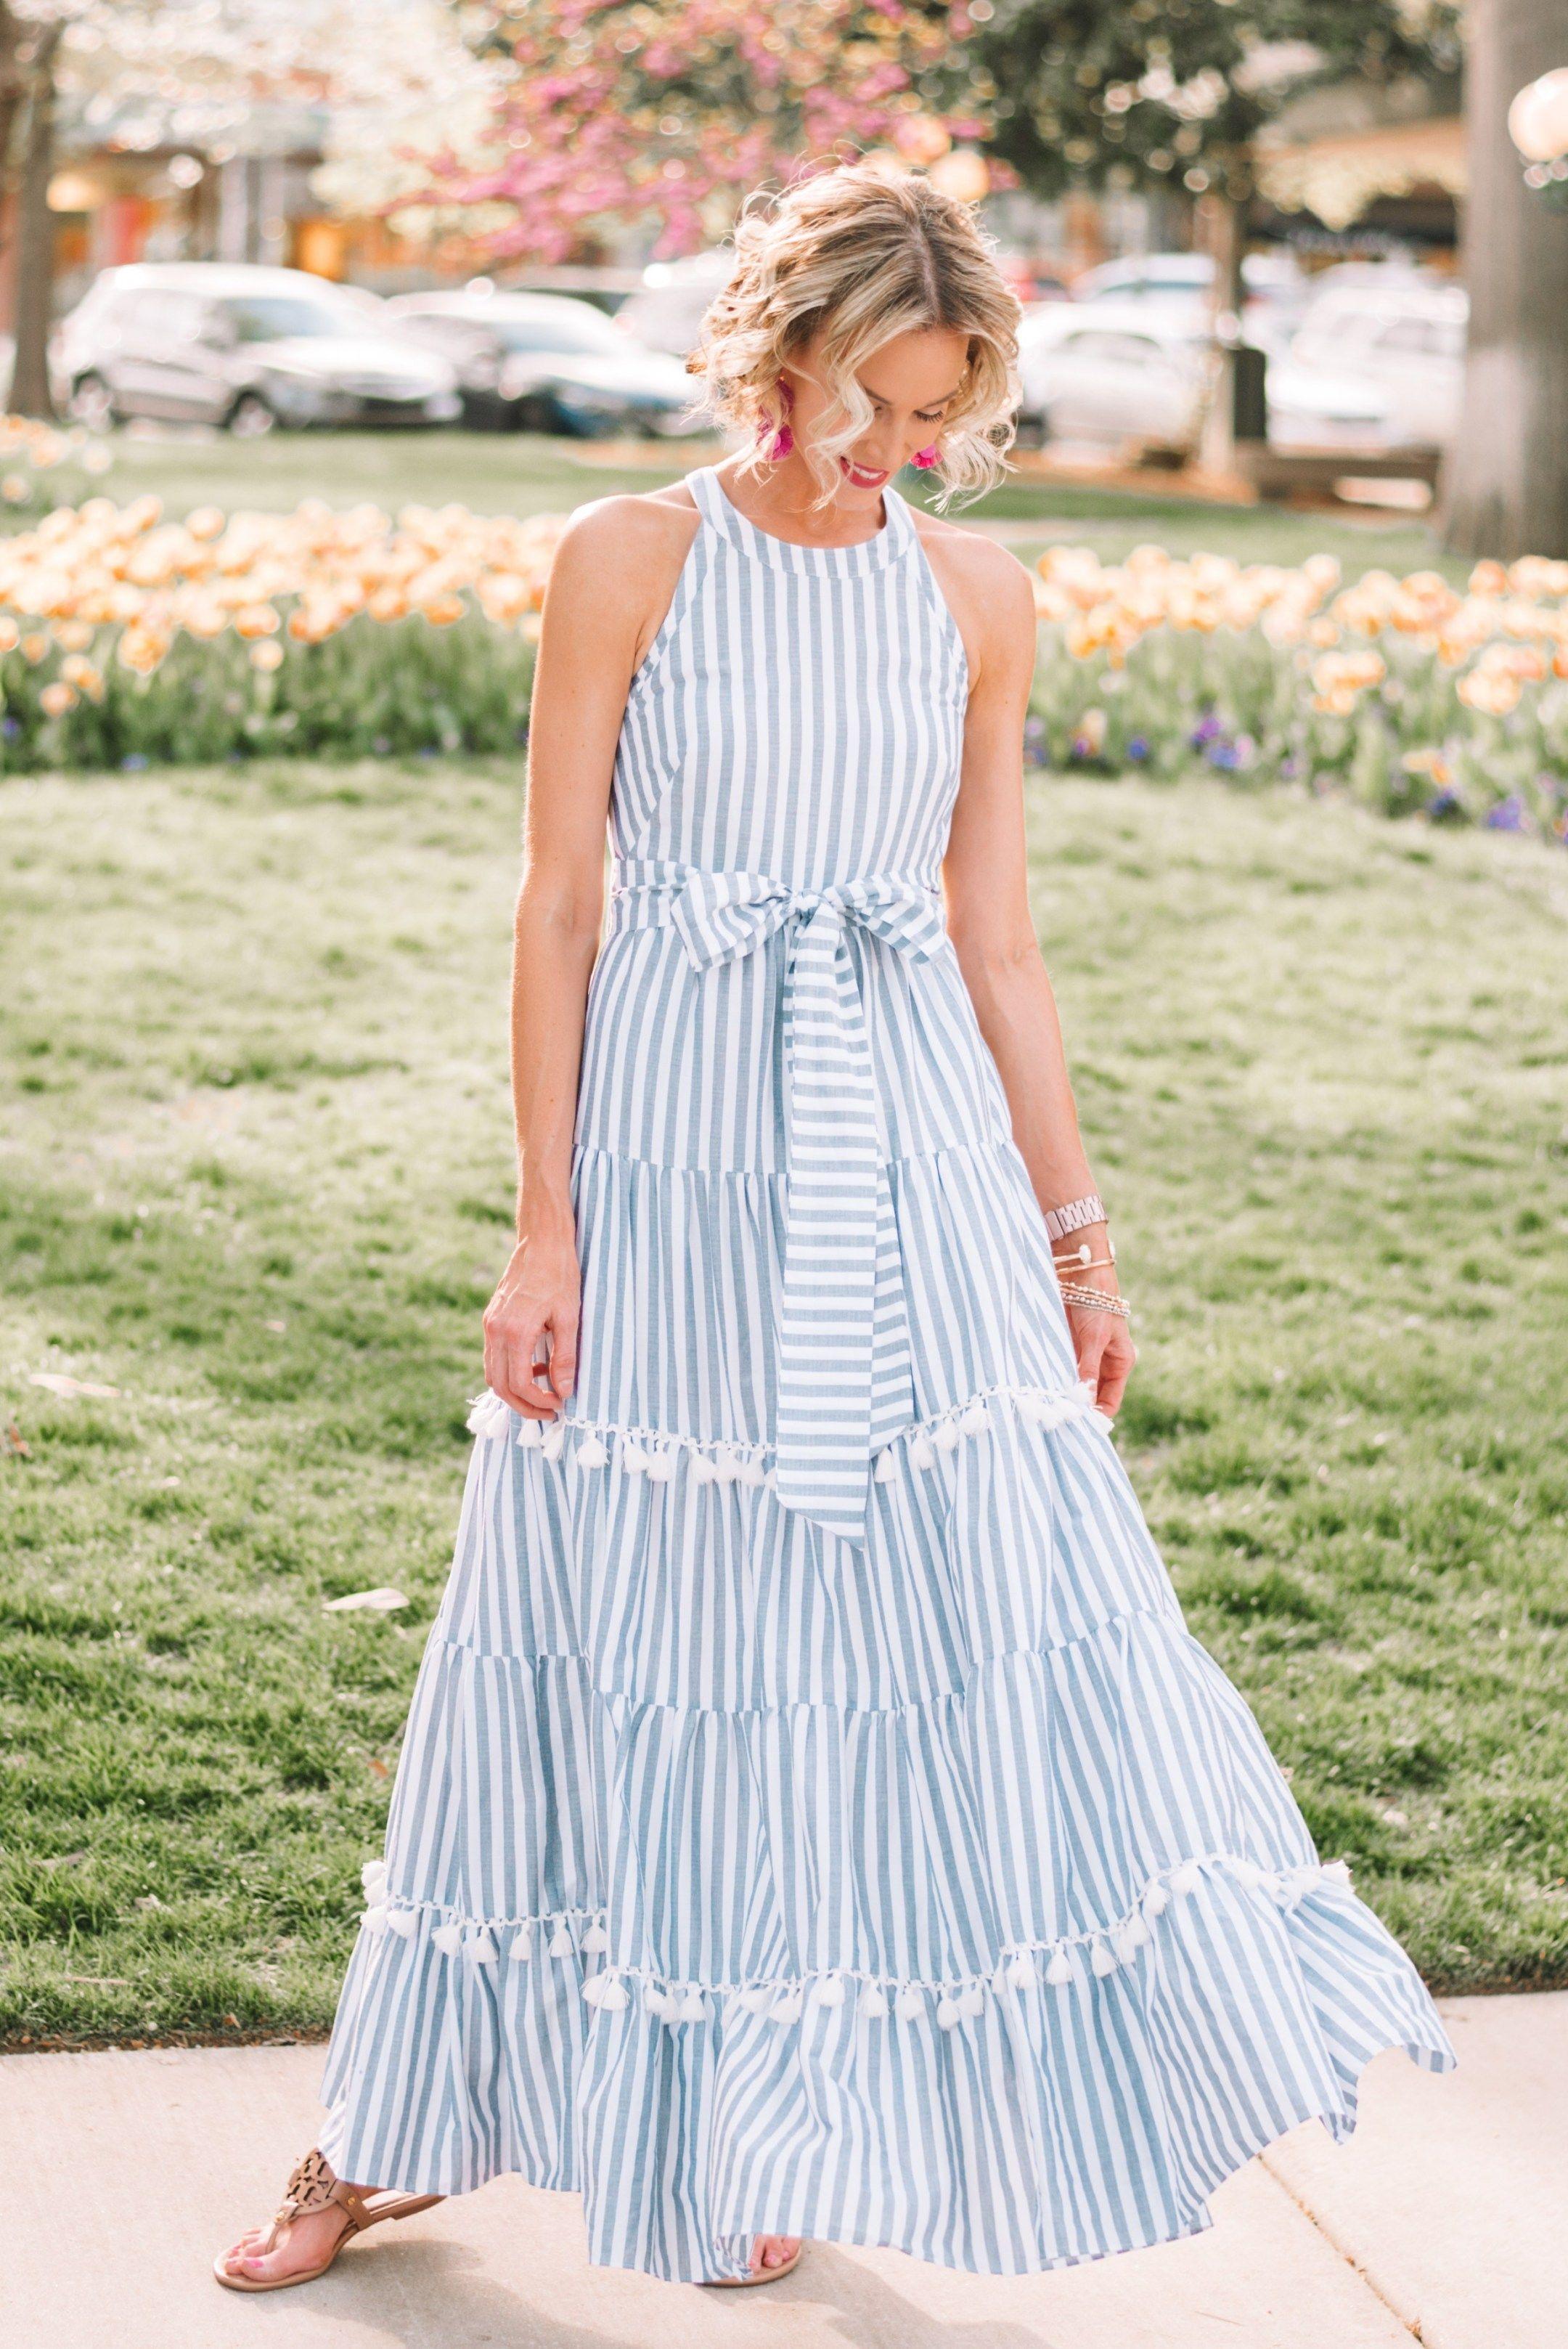 The Maxi Dress Of My Dreams Straight A Style Long Flowy Maxi Dresses Striped Maxi Dresses Tiered Maxi Dress [ 3235 x 2160 Pixel ]